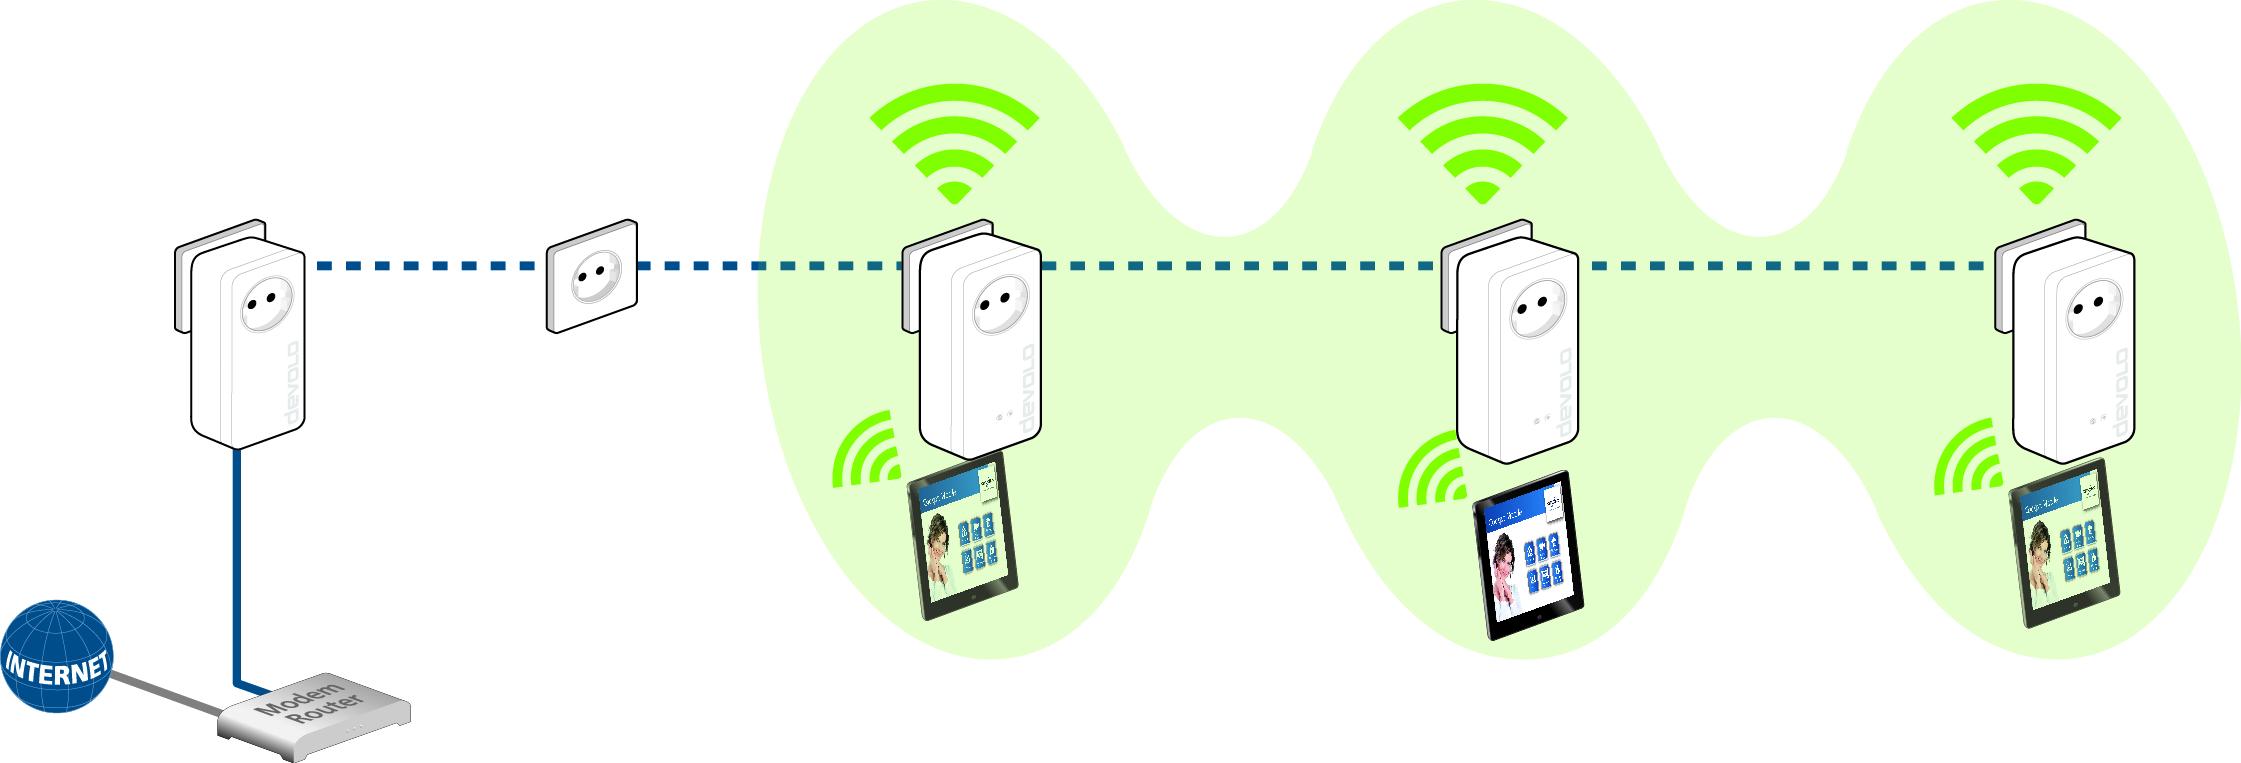 devolo dlan 1200 WiFi Starter Kit Análisis 6